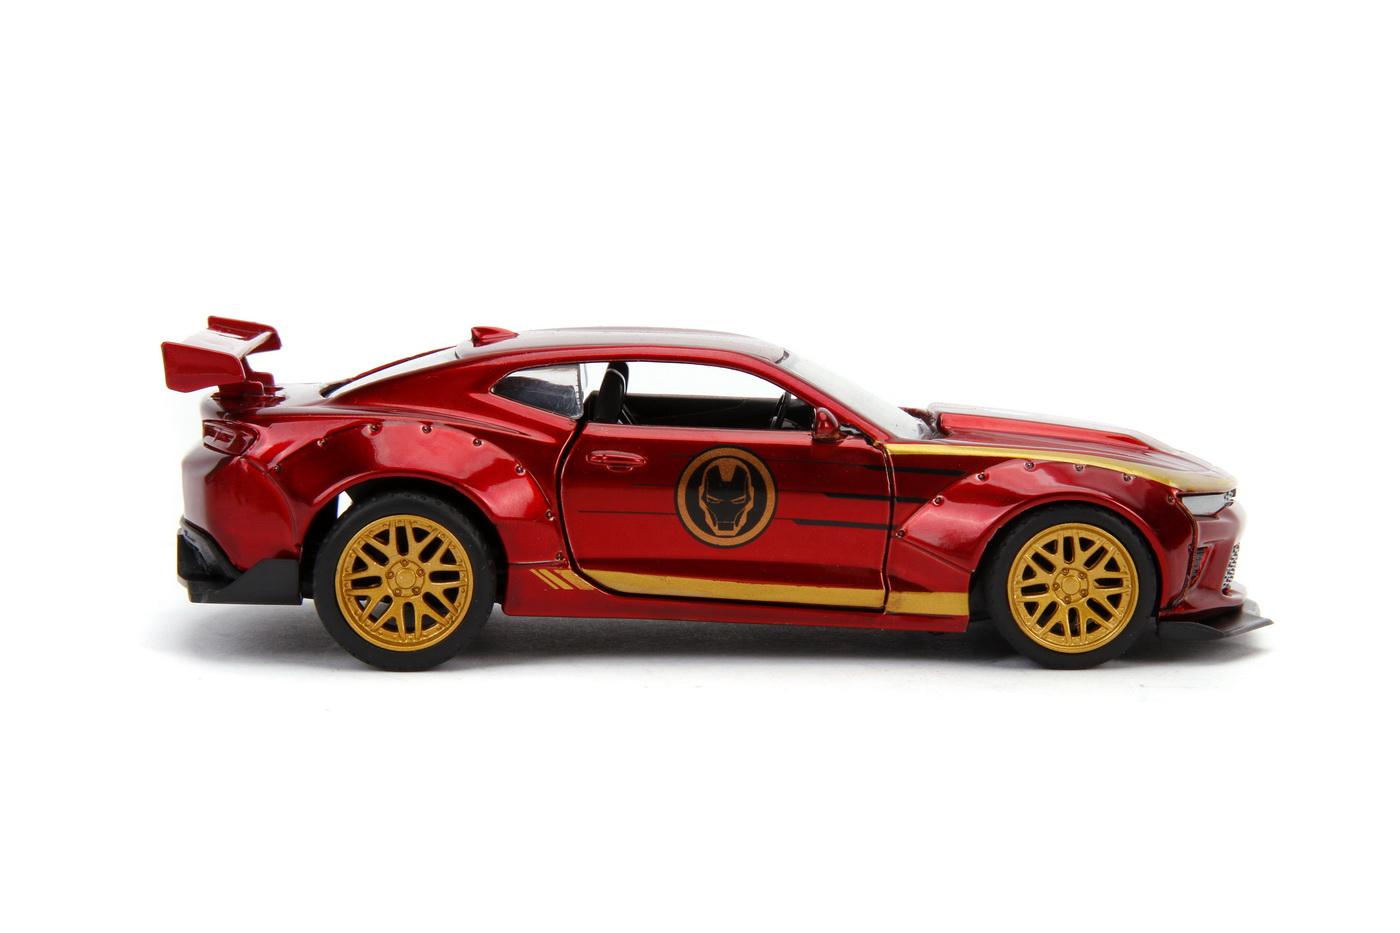 Masinuta Metalica Iron Man 2016 Chevy Camaro Ss Scara 1 La 32 | JadaToys - 8